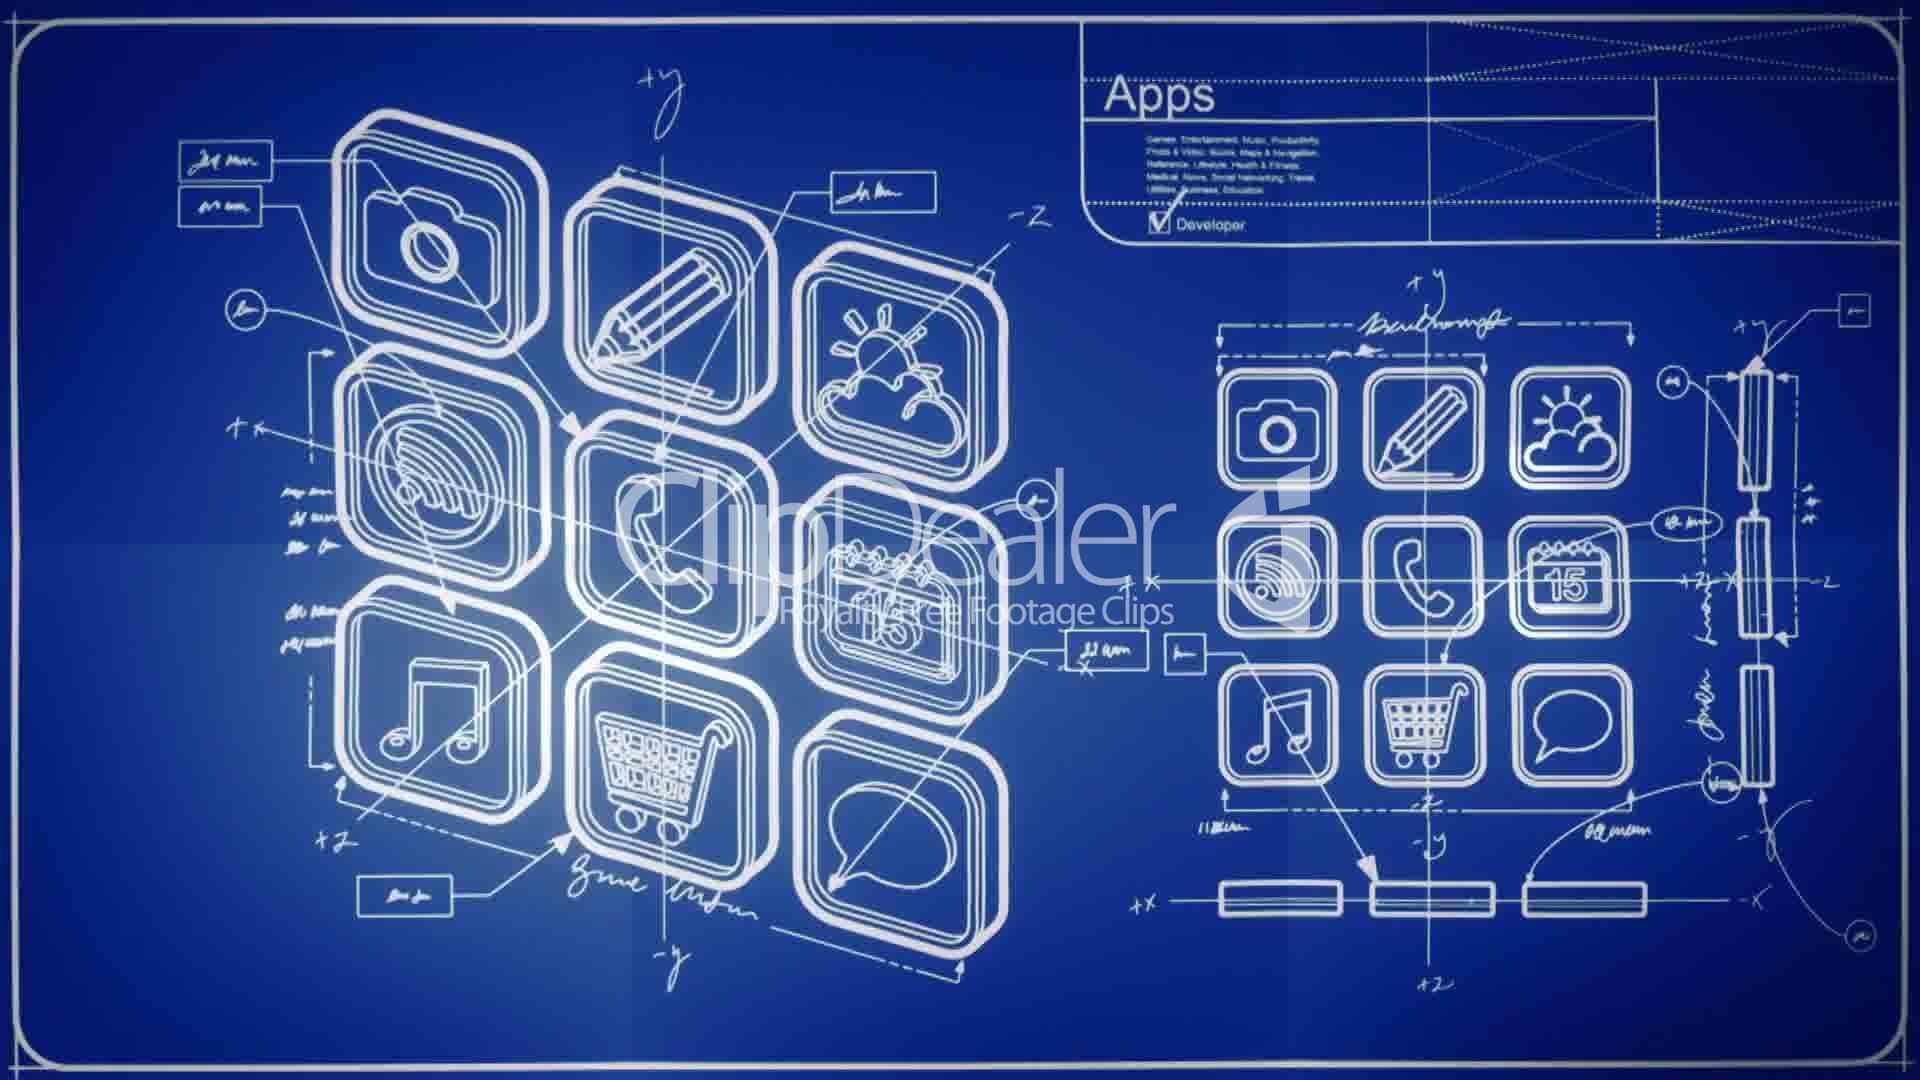 Synergic links for App for blueprints